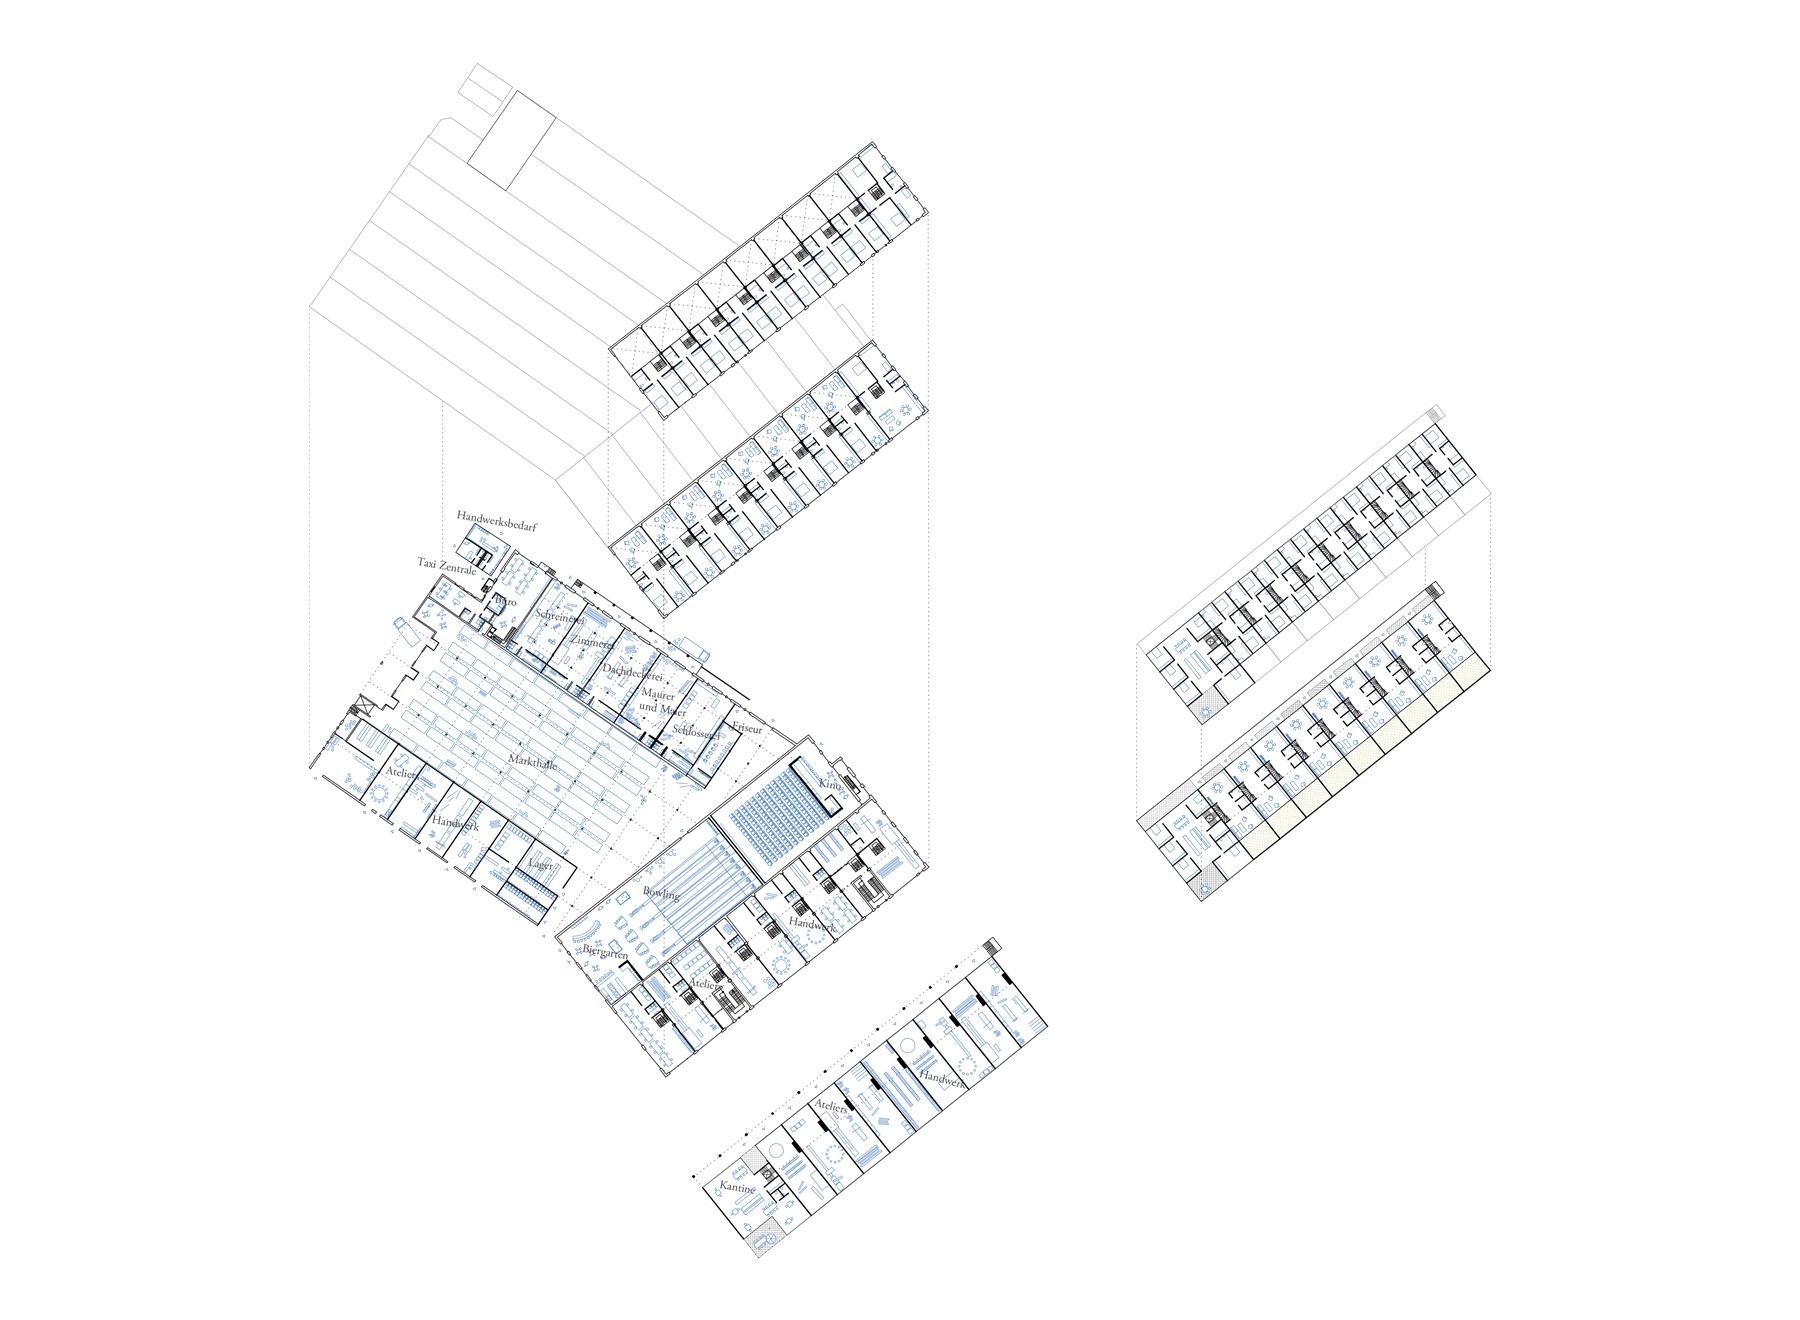 floor plans for Eduardstr. 40 and worker's yard